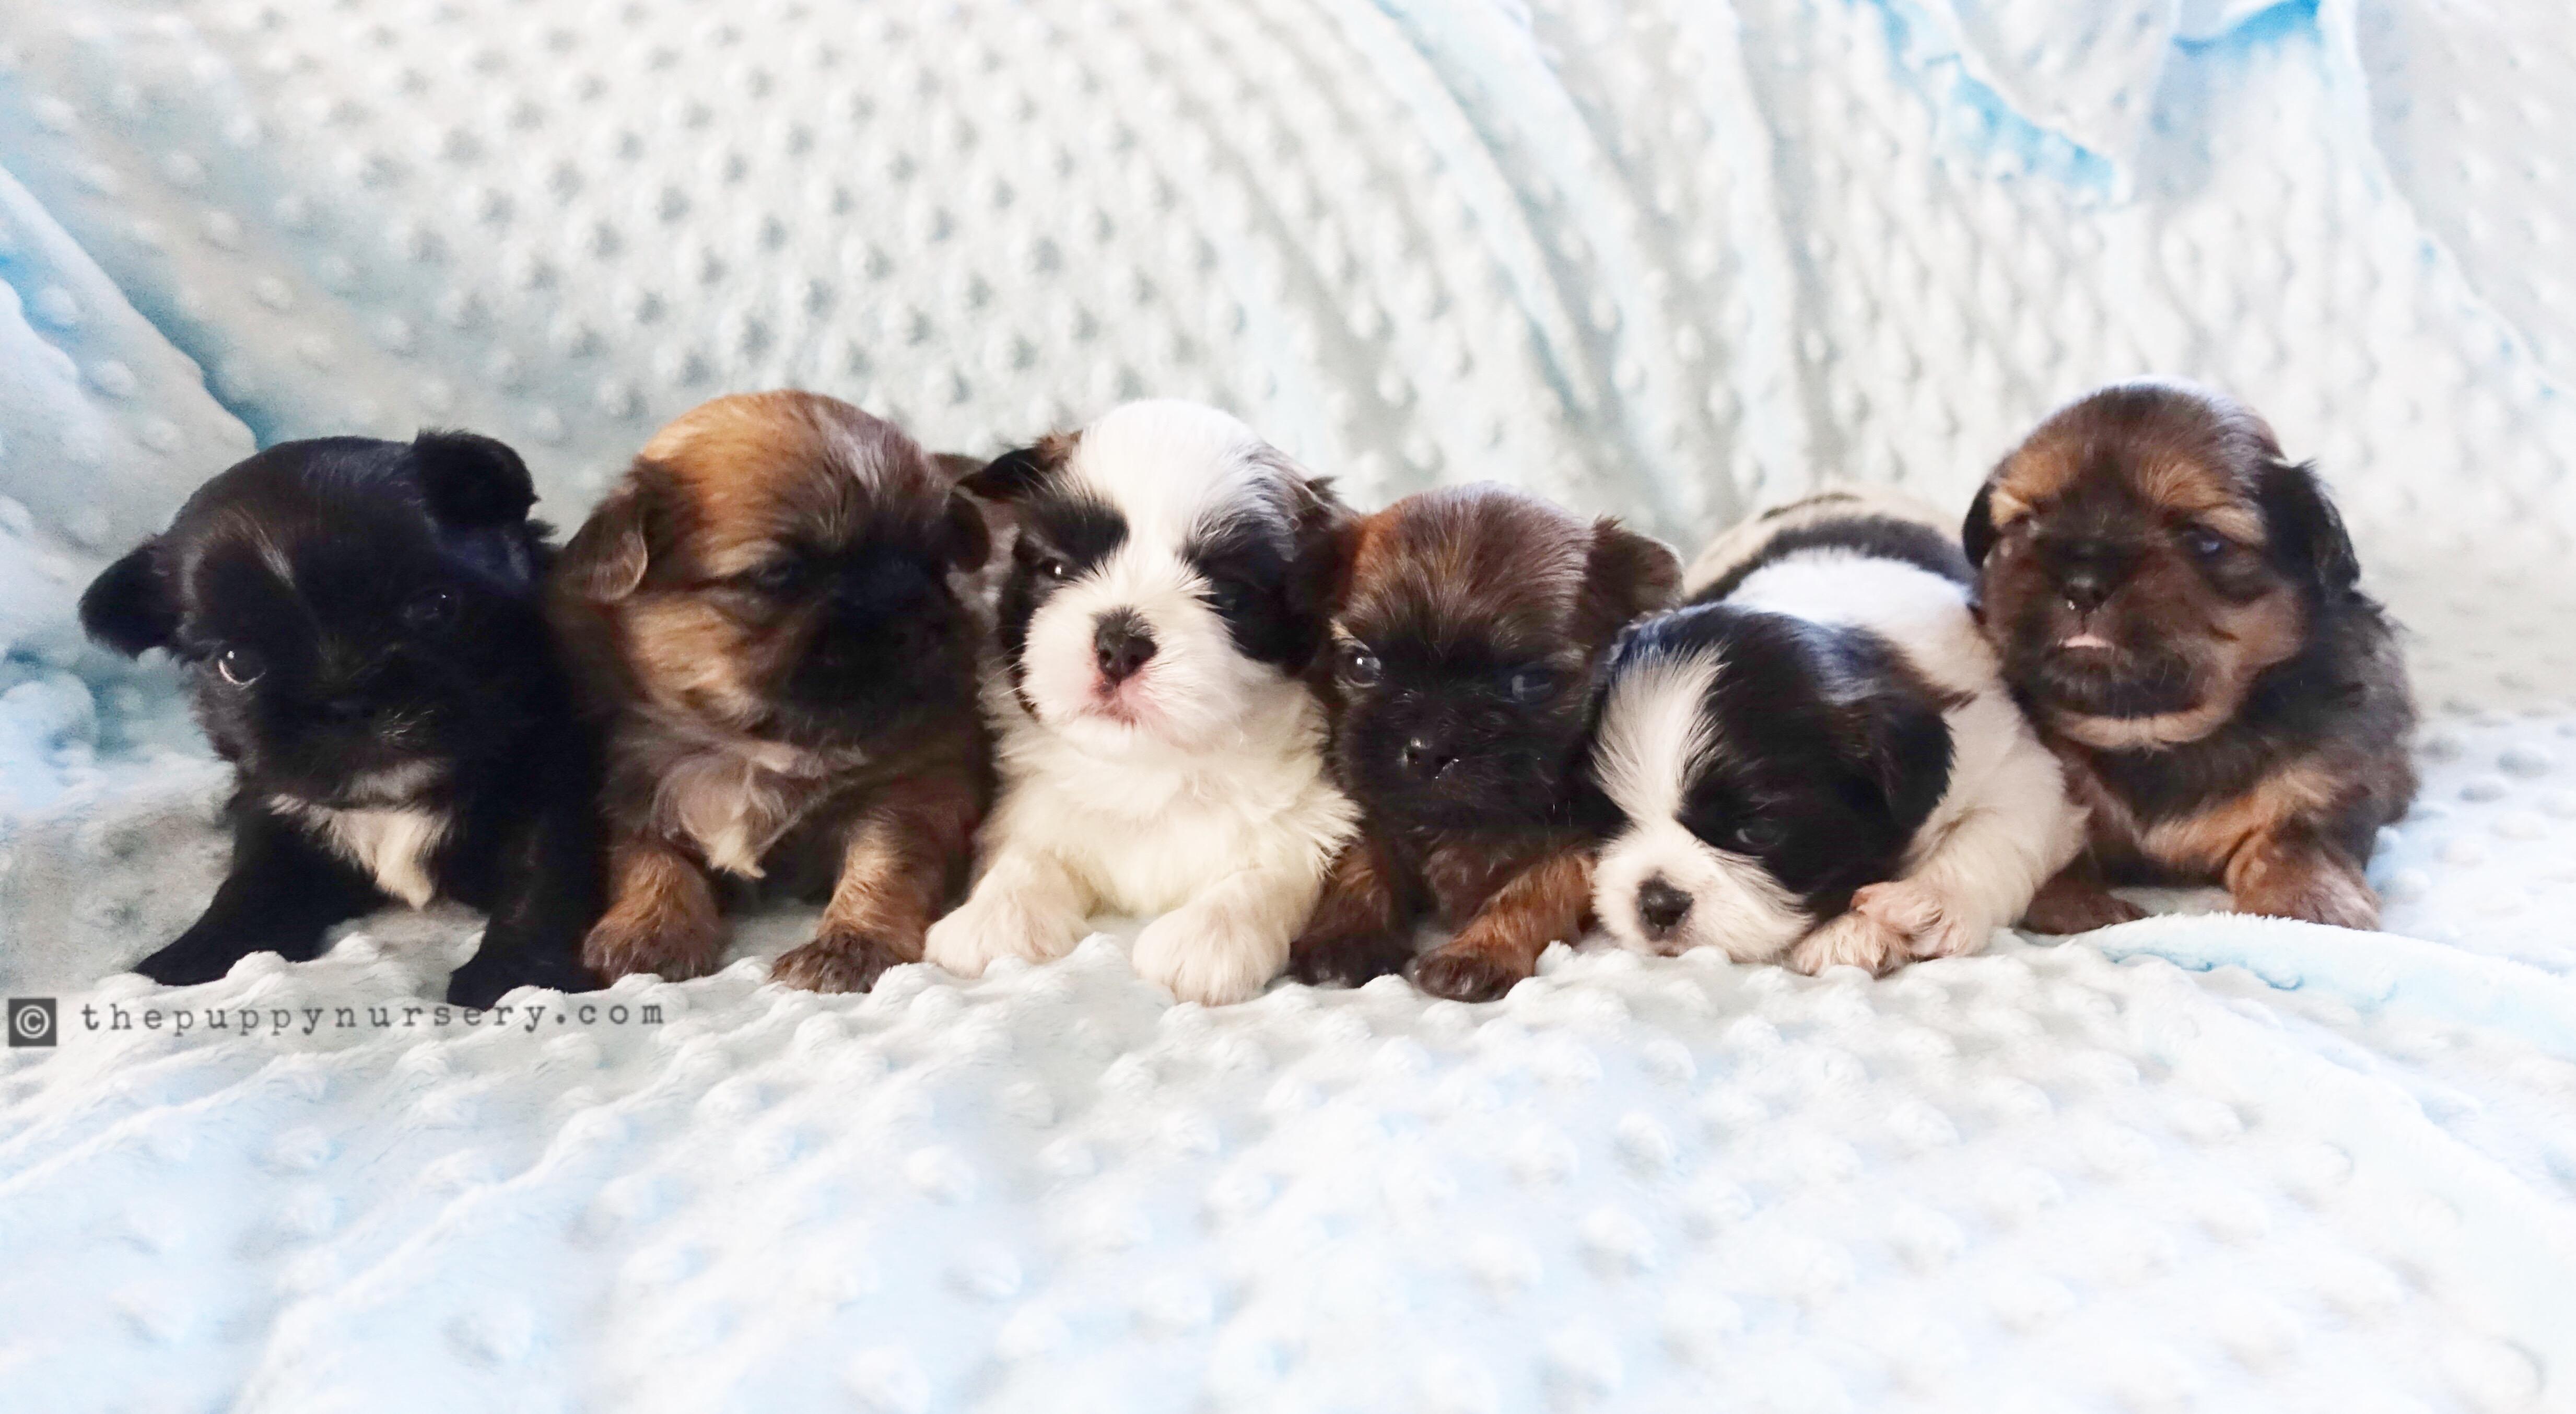 Akc Shih Tzu Yorkie Puppies Tustin Ca The Puppy Nursery